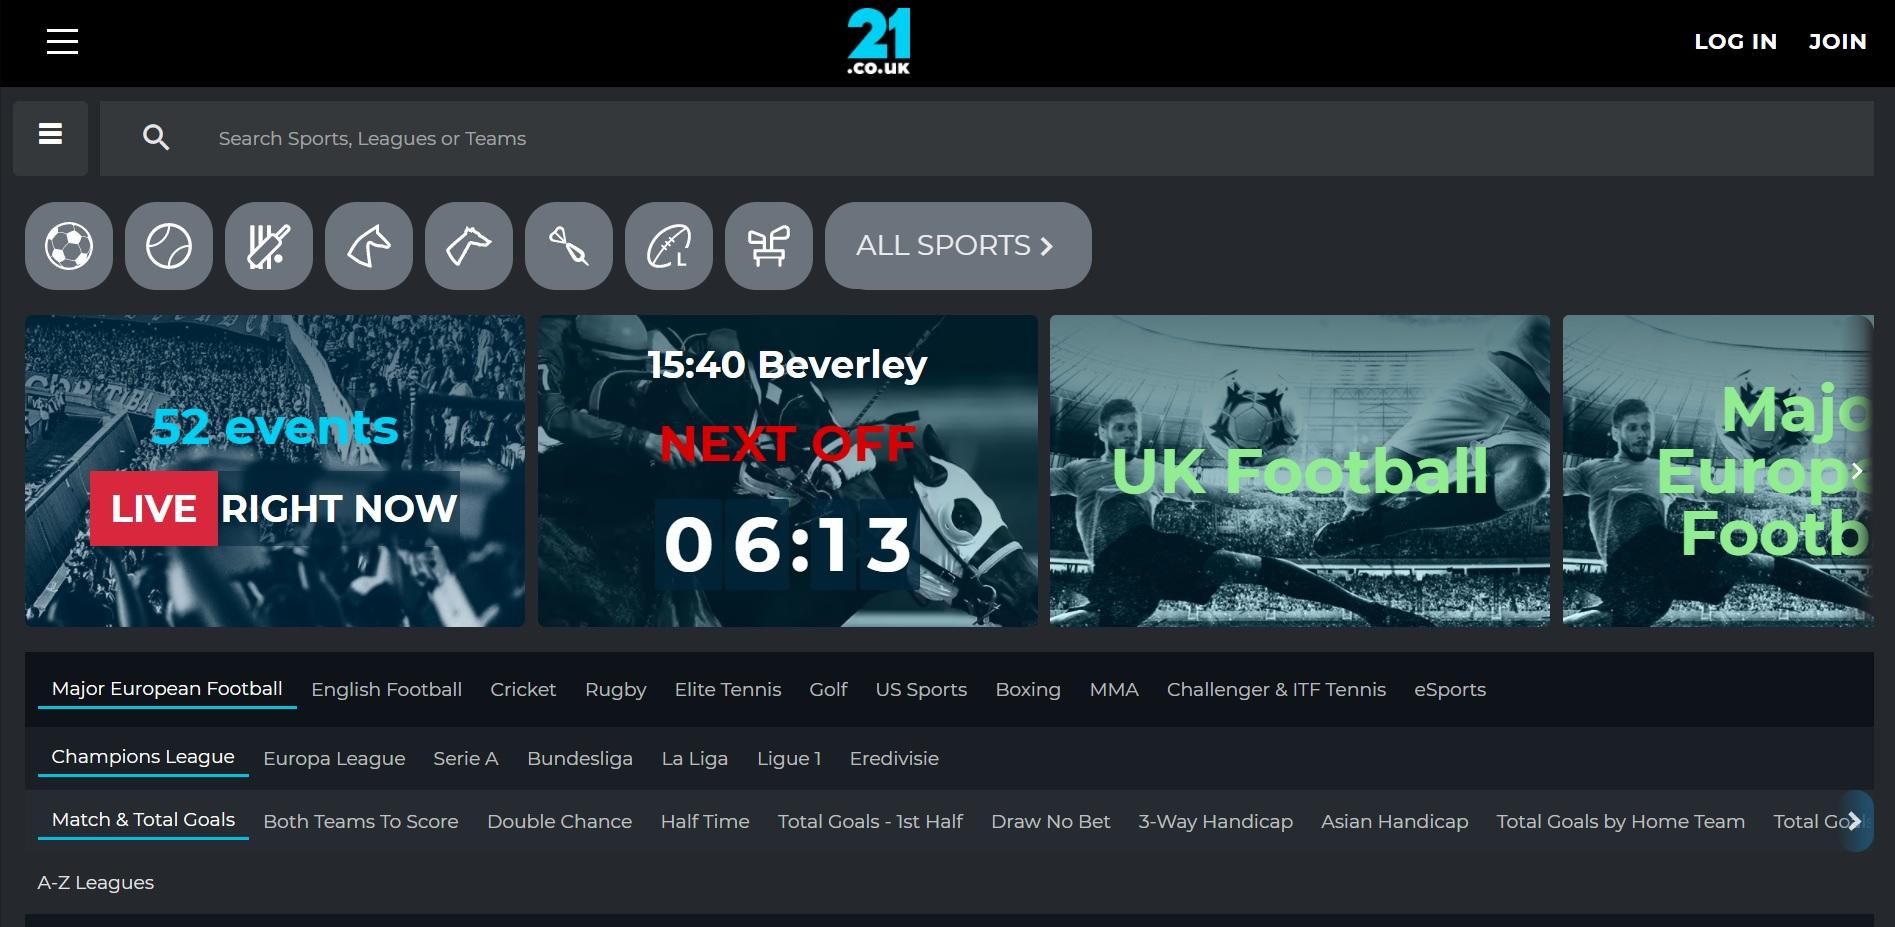 best betting sites UK 21.co.uk